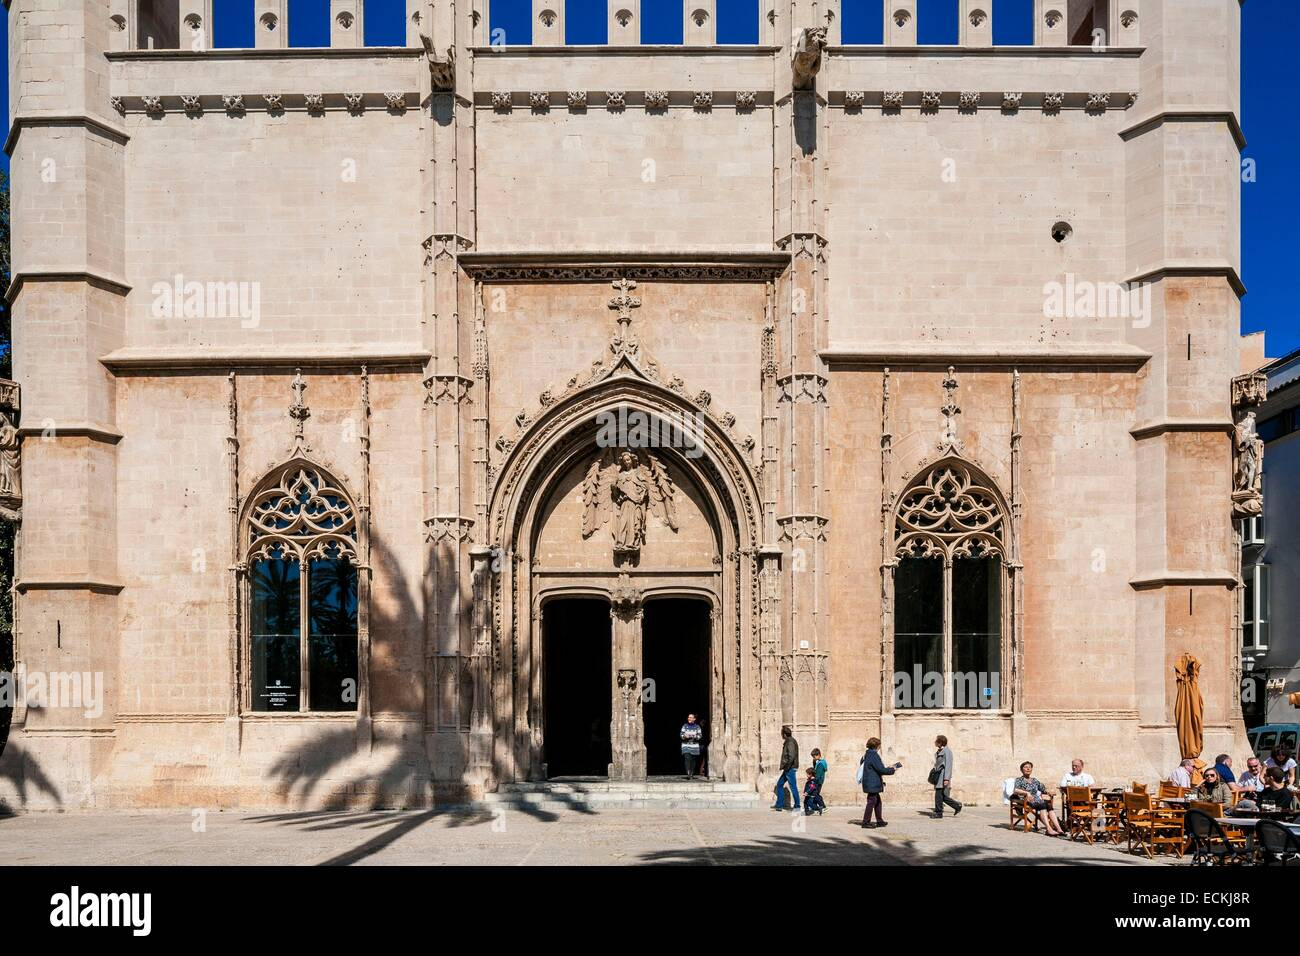 Spain, Balearic Islands, Majorca, Palma de Mallorca, Sa Llotja, Loge des Marchands (15th century) Gothic style that Stock Photo